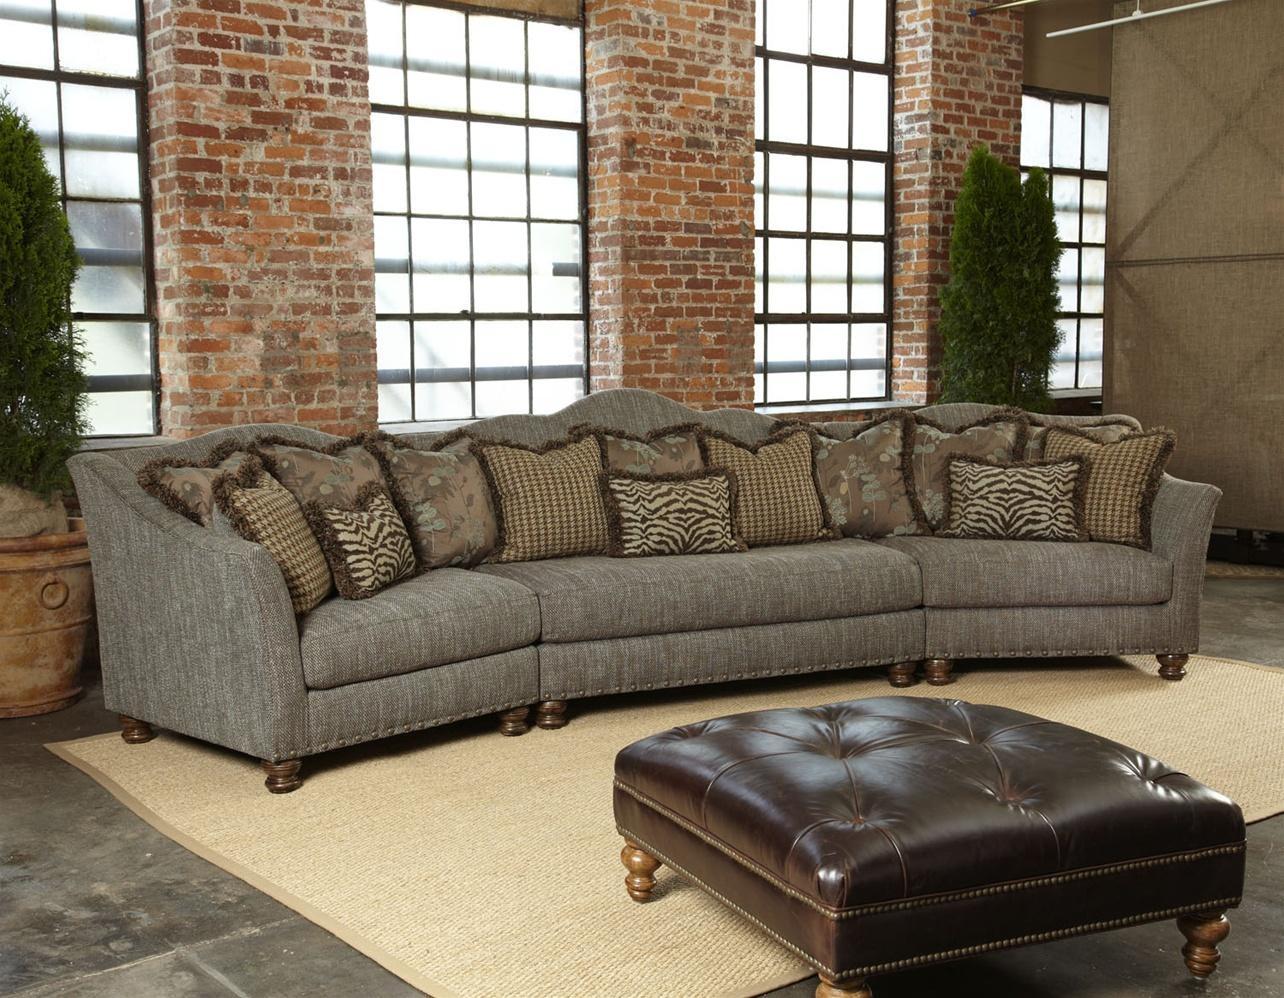 living room furniture tampa florida year of clean water rh yearofcleanwater org